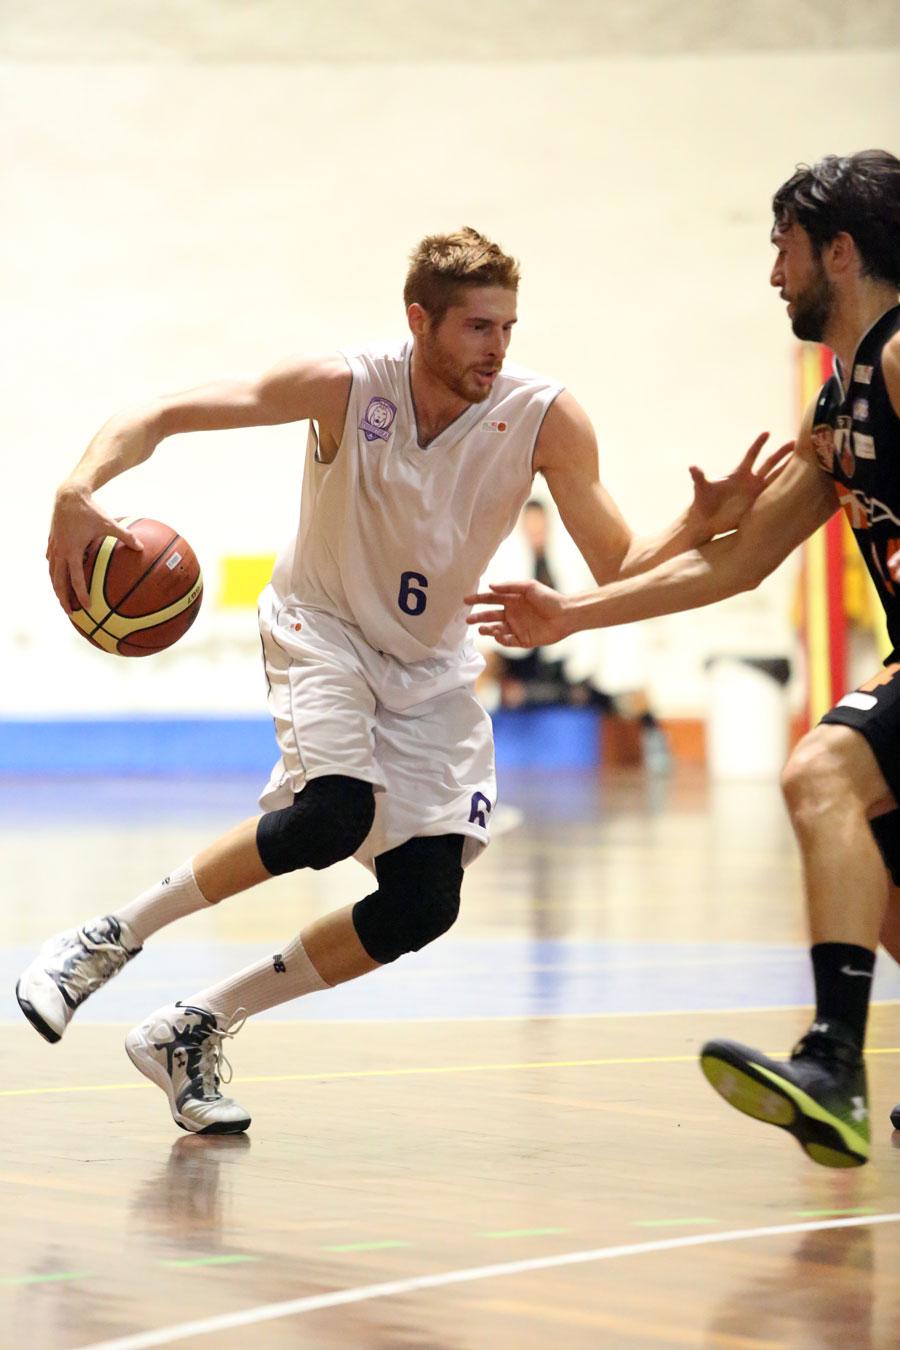 andrea_marusic2015_fiorentina_basket